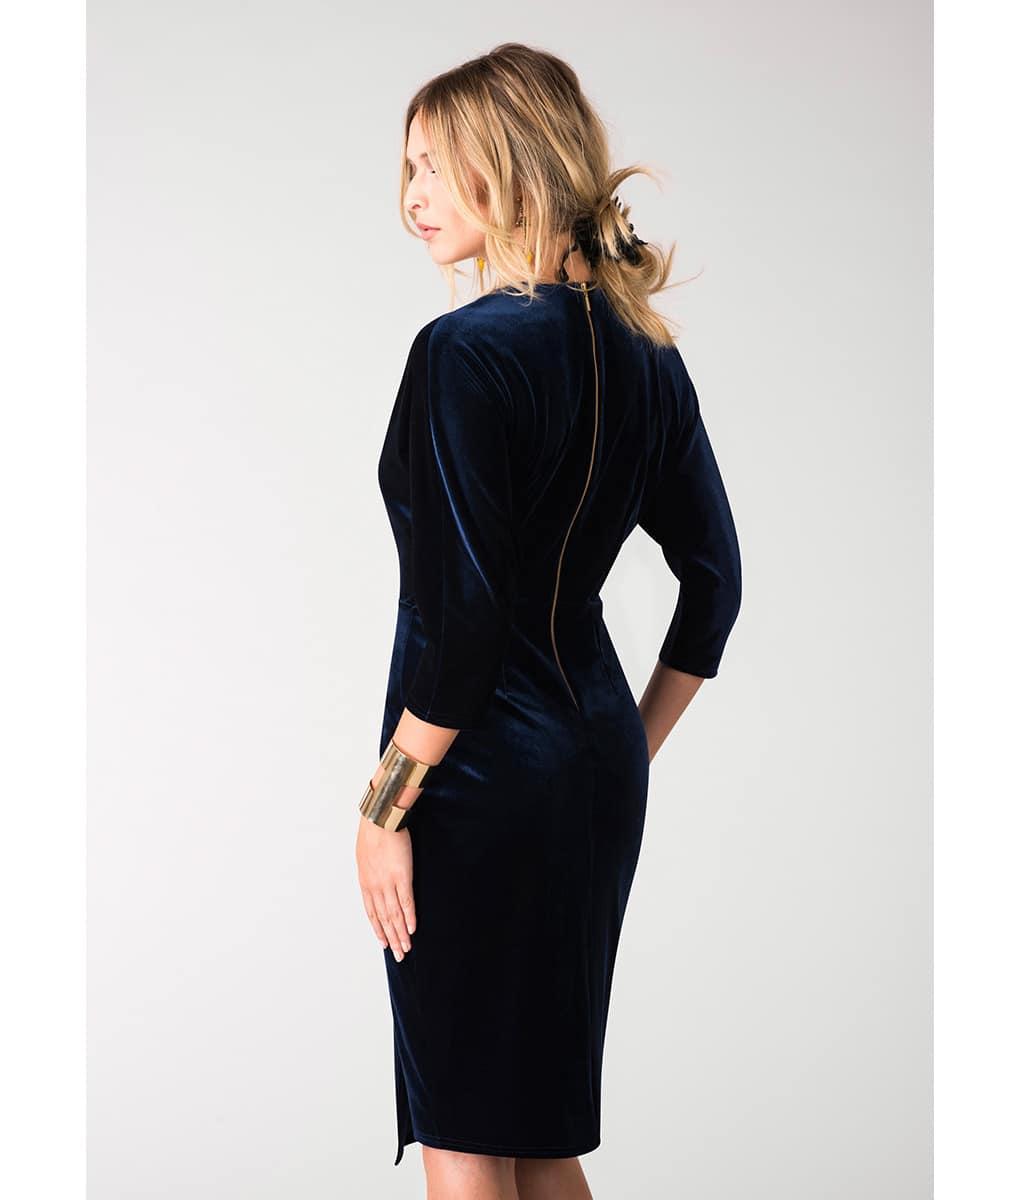 Alila-Navy-Velvet-plunge-neck-midi-dress-by-Closet-London